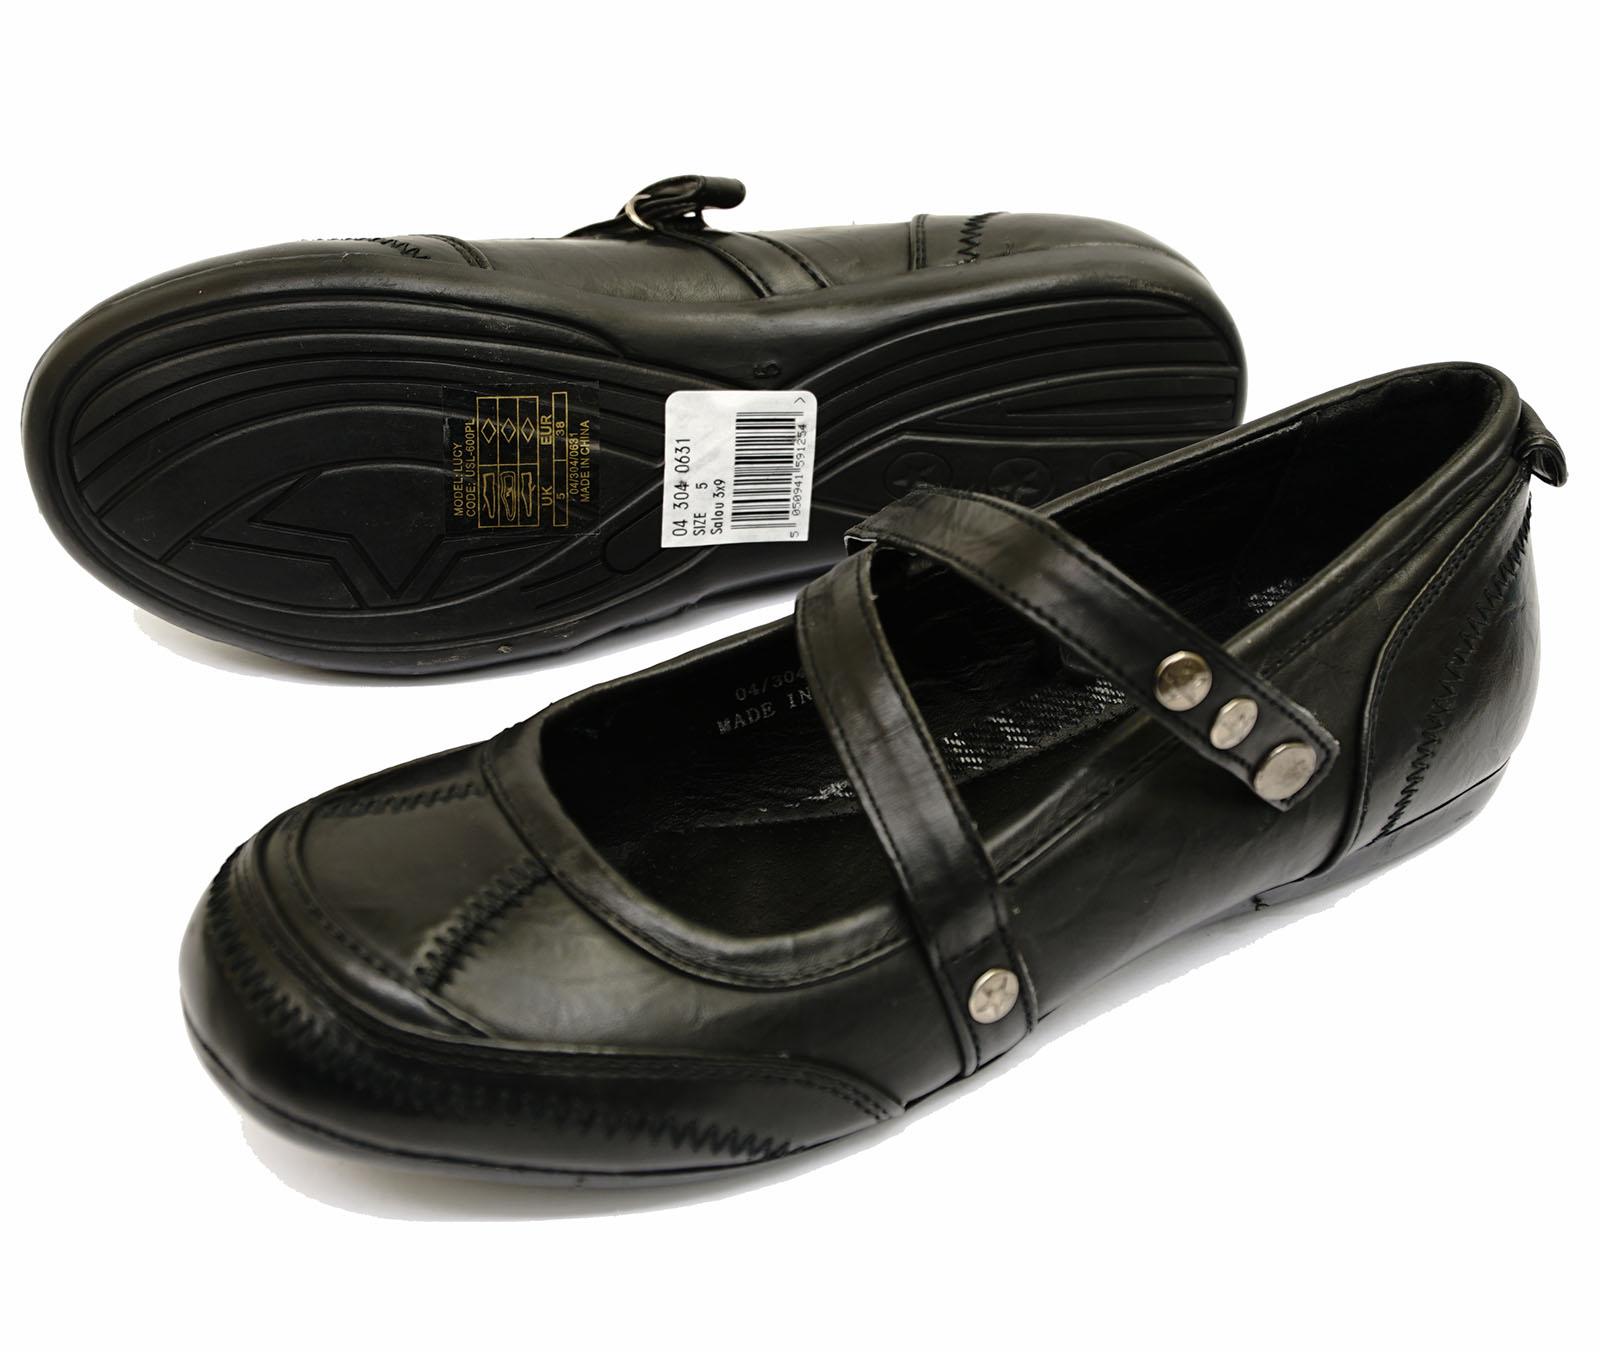 LADIES FLAT SLIP-ON BLACK CASUAL BALLERINA COMFY DOLLY ...